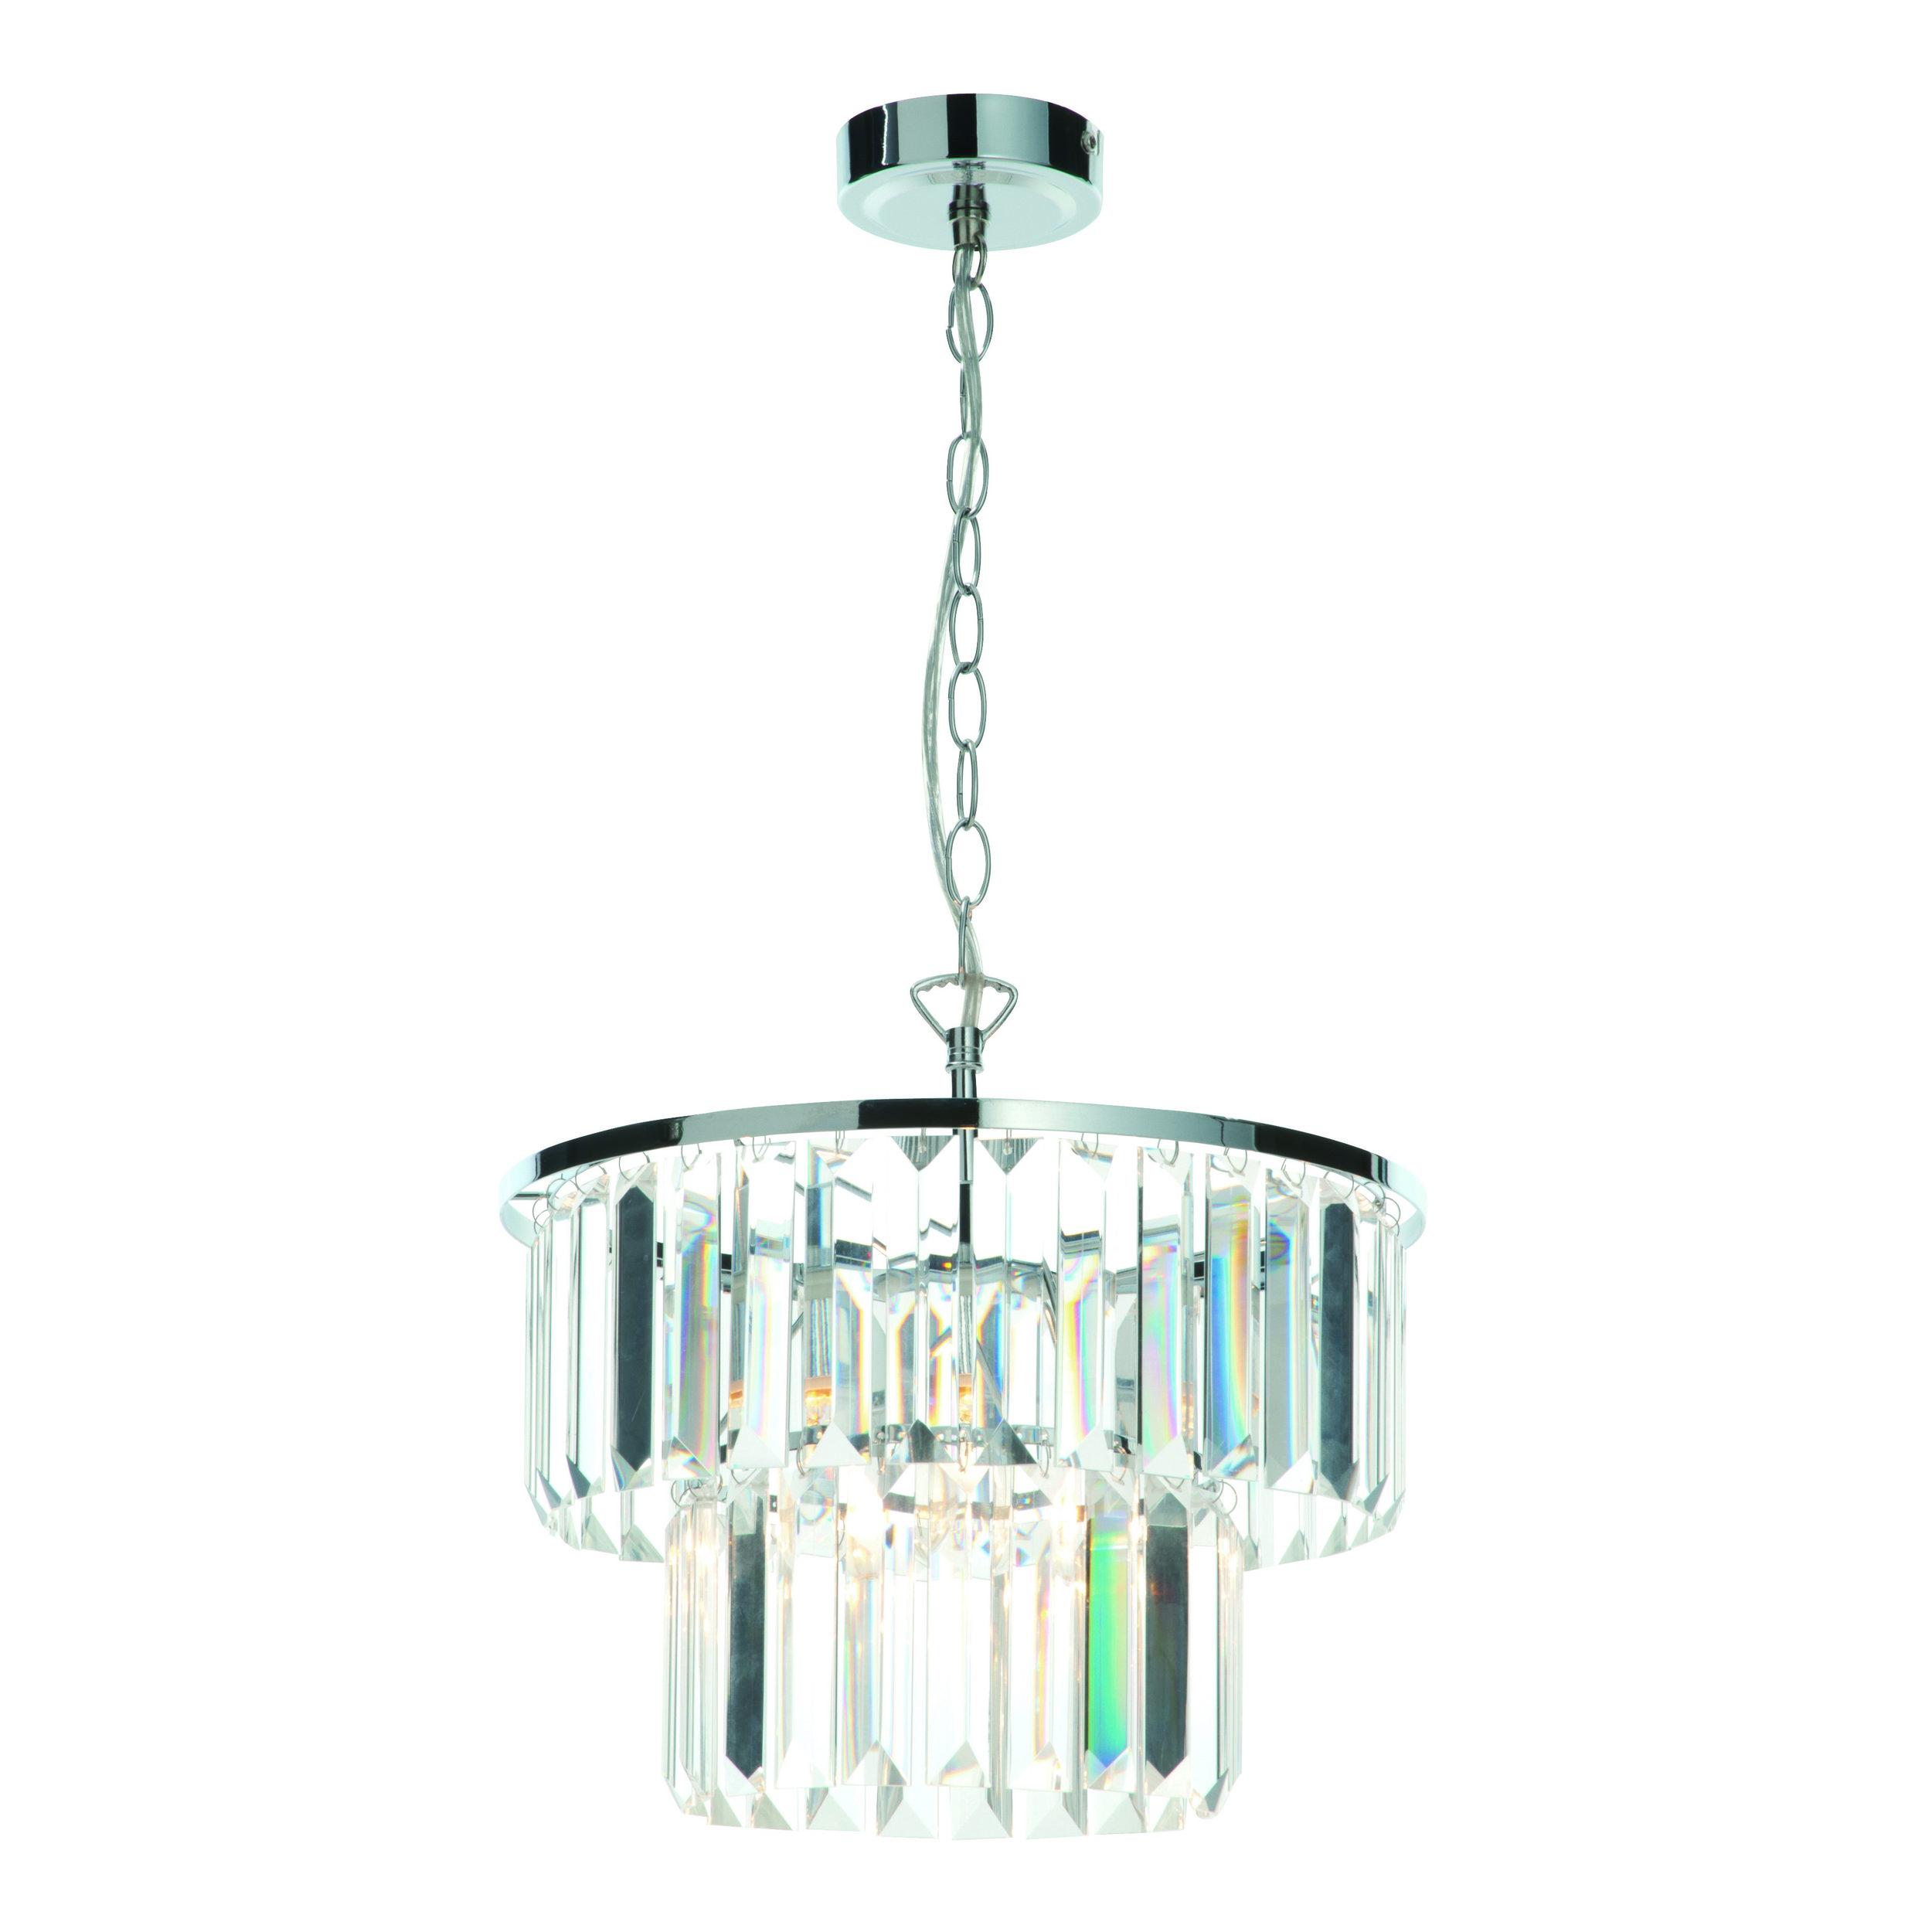 http://www.diy.com/departments/knightsbridge-faceted-glass-clear-pendant-ceiling-light/333436_BQ.prd